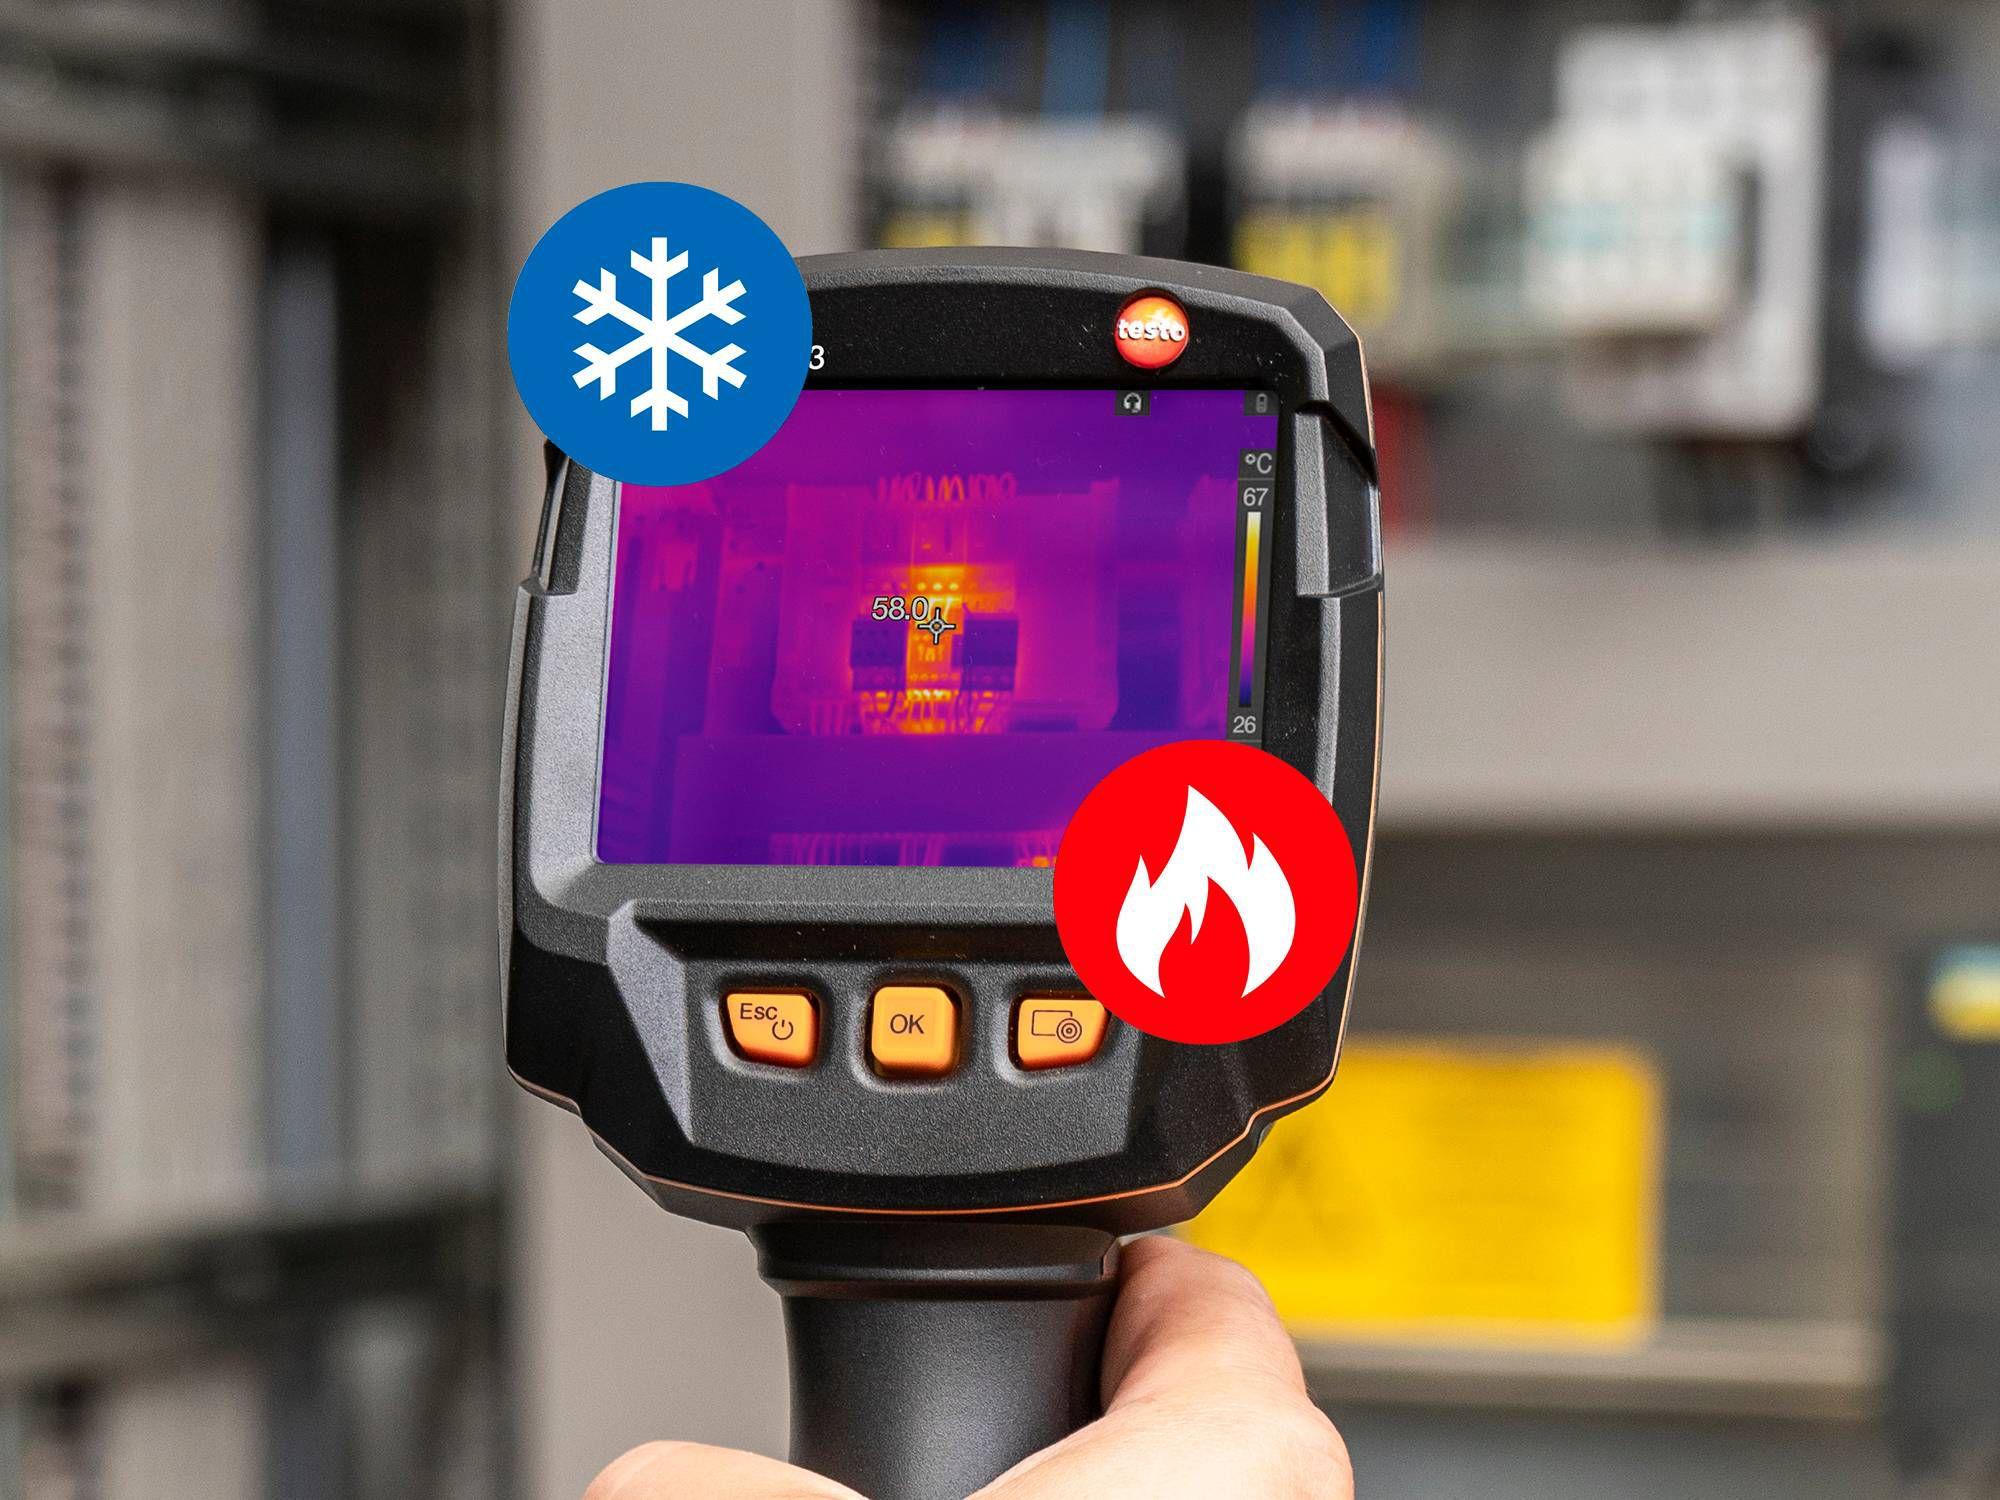 testo-883-thermography-hot-spots-2000x1500.jpg